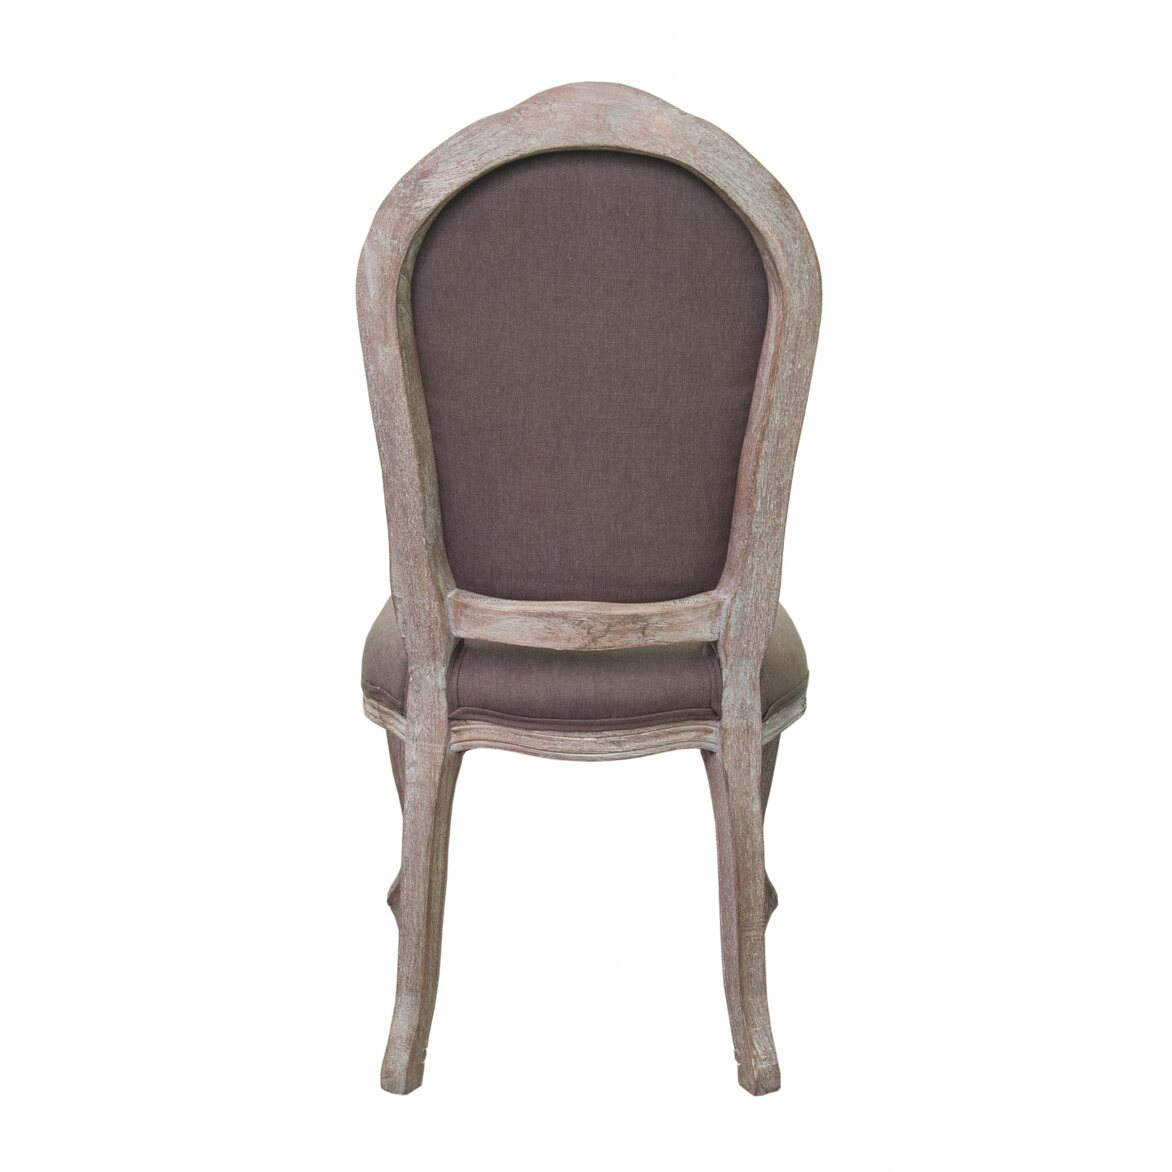 Стул Grand brown 3 | Обеденные стулья Kingsby